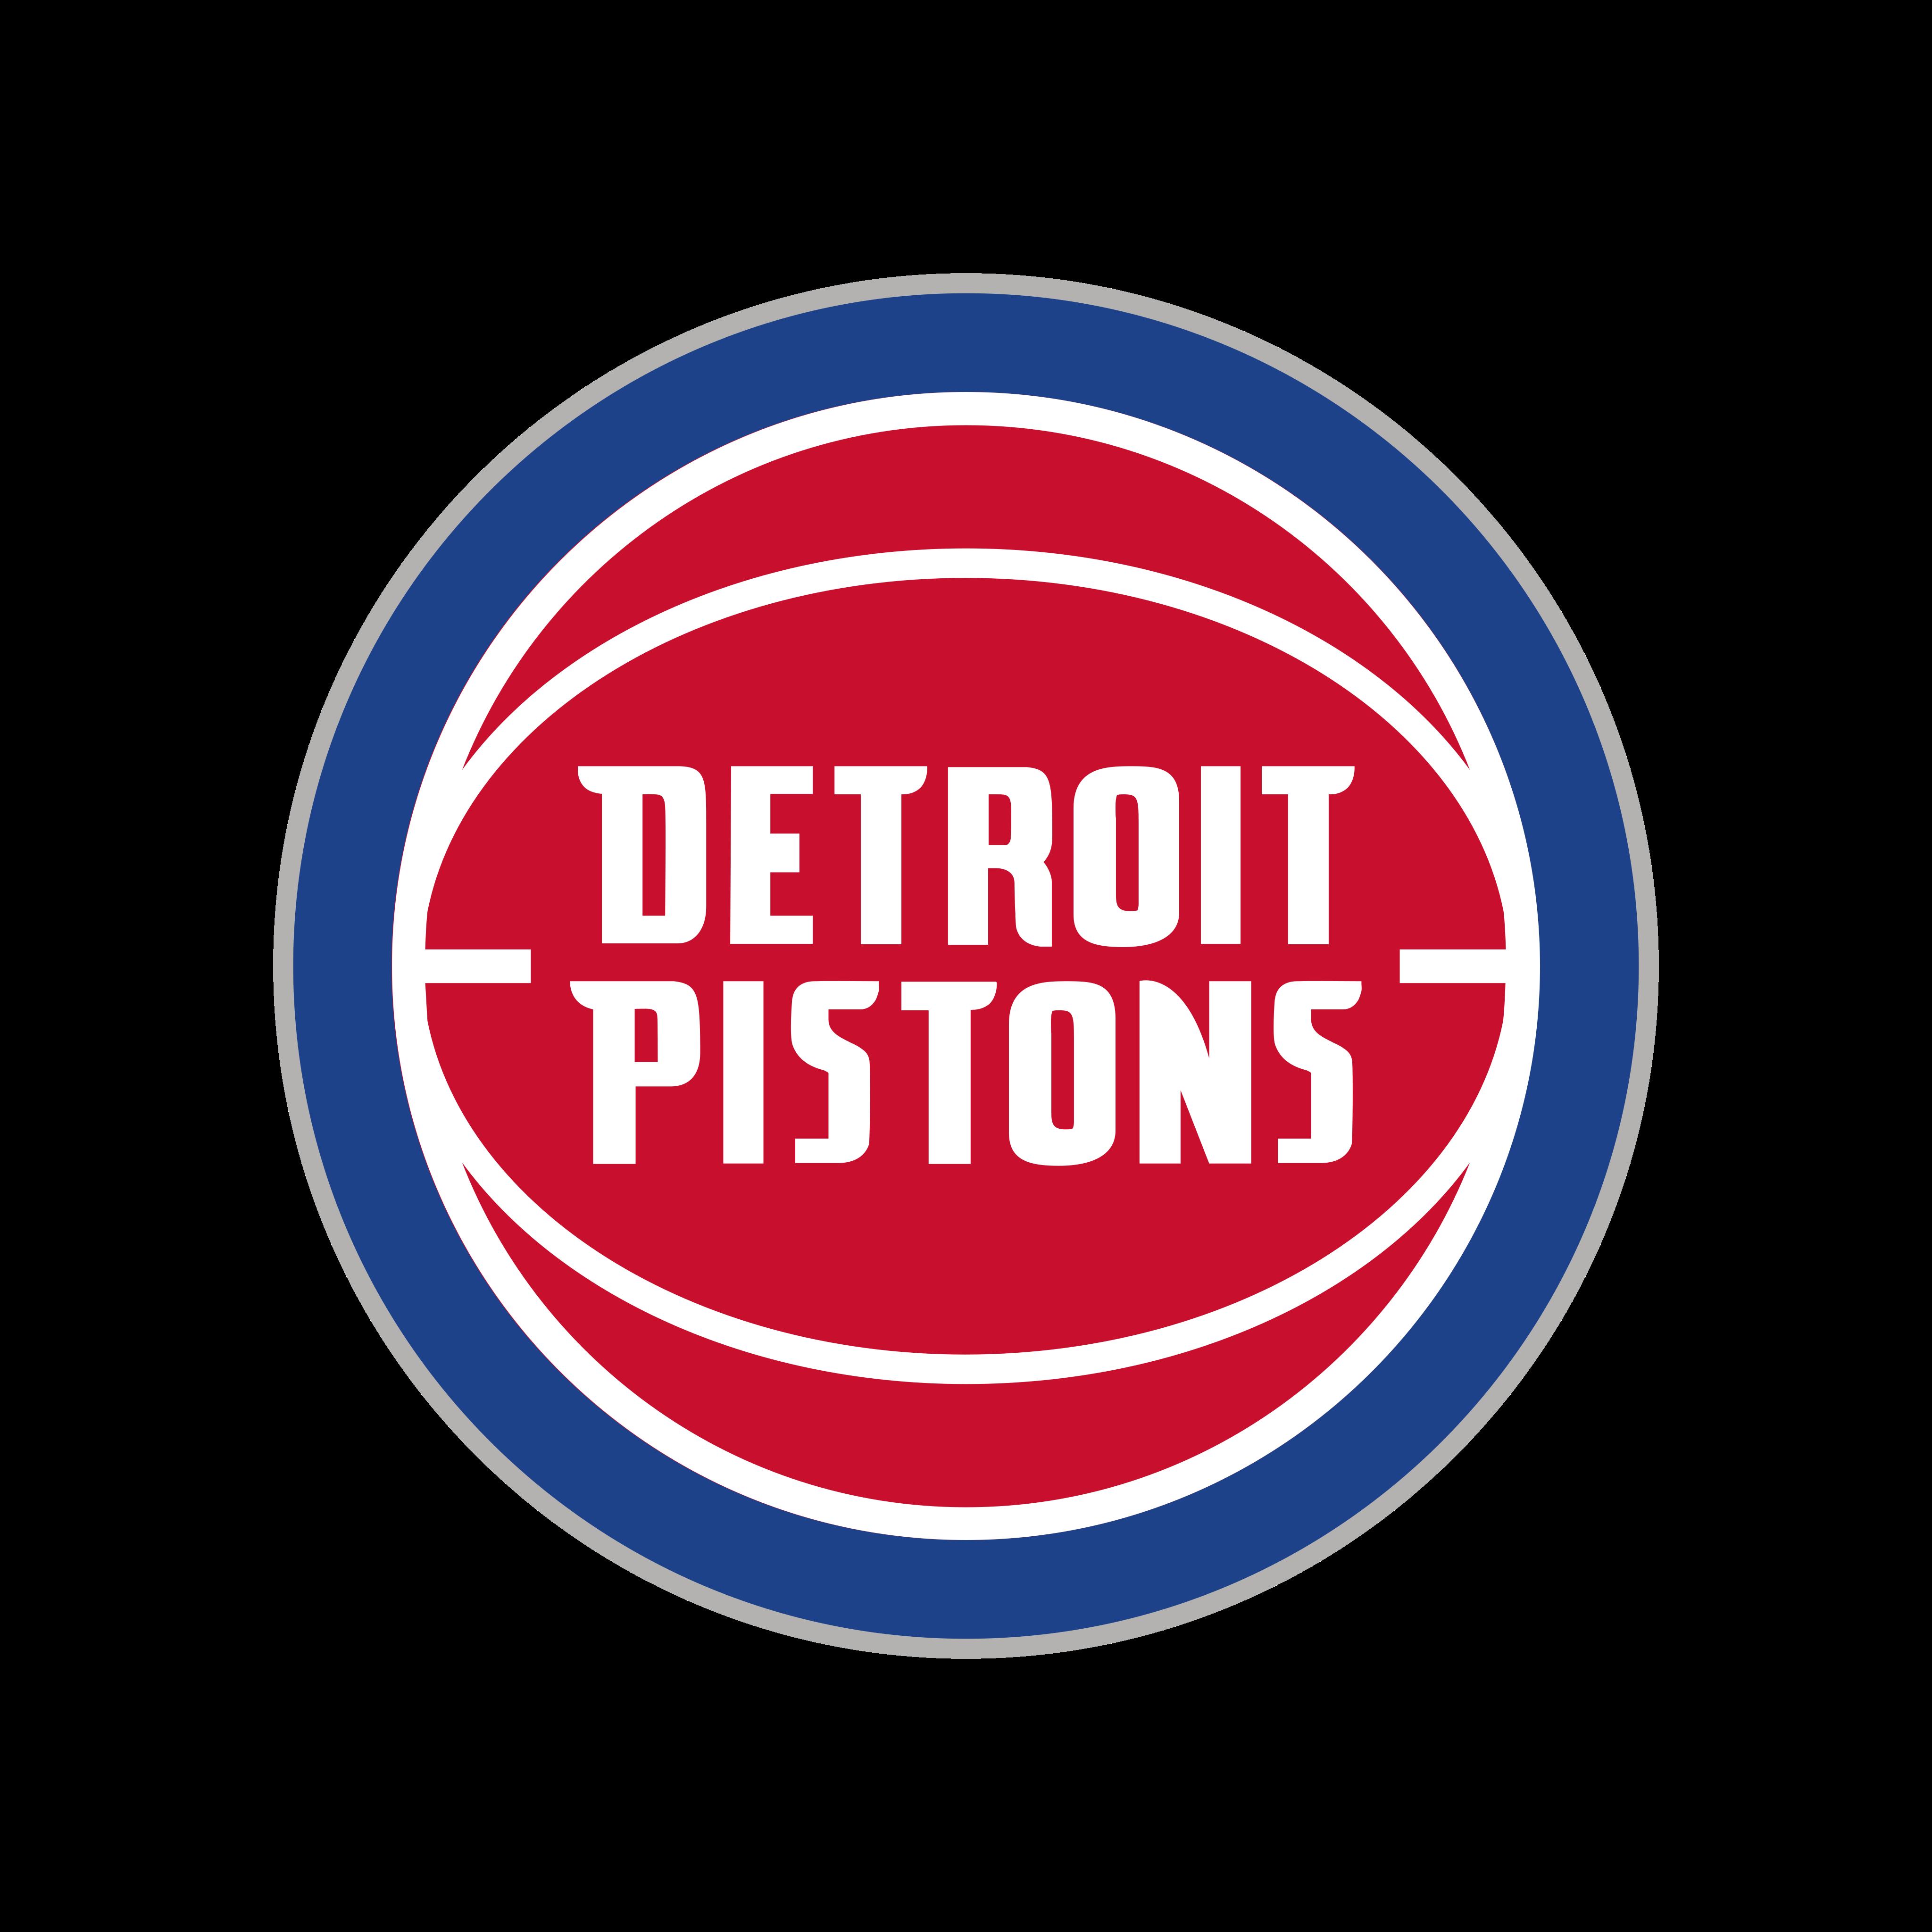 detroit pistons logo 0 - Detroit Pistons Logo